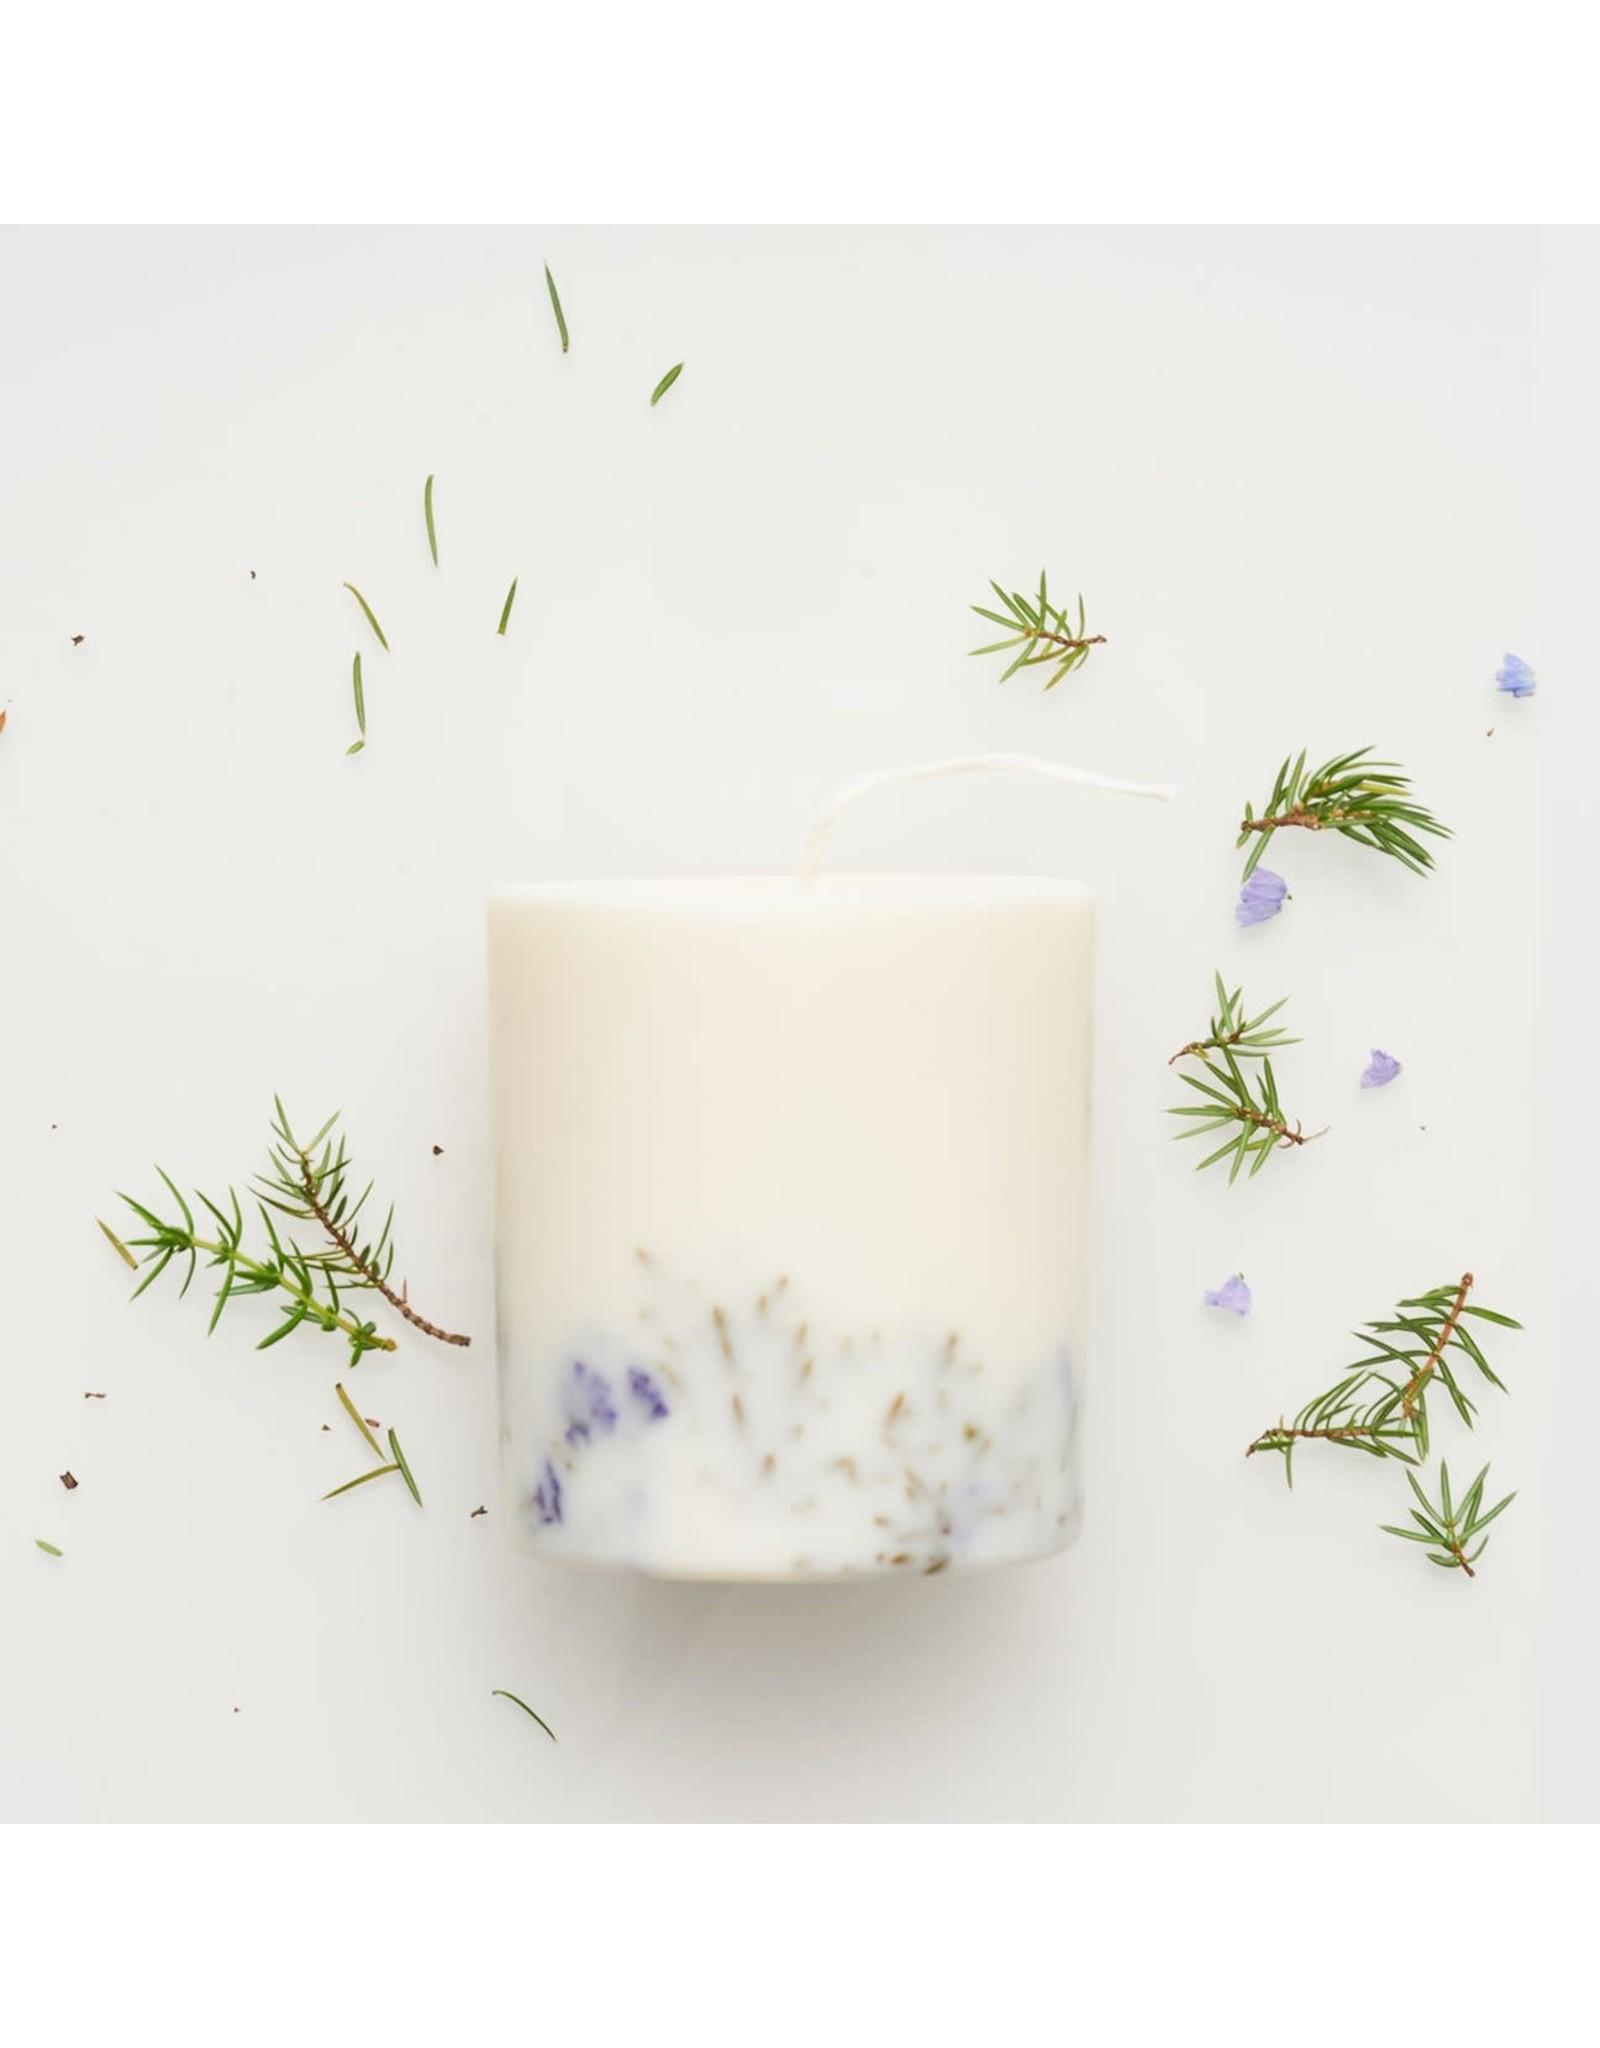 Munio Candela Candle - Juniper & Limonium - Natural Soy Wax - 515ml - Dia 8cm x H 10cm - Burn Time 50h